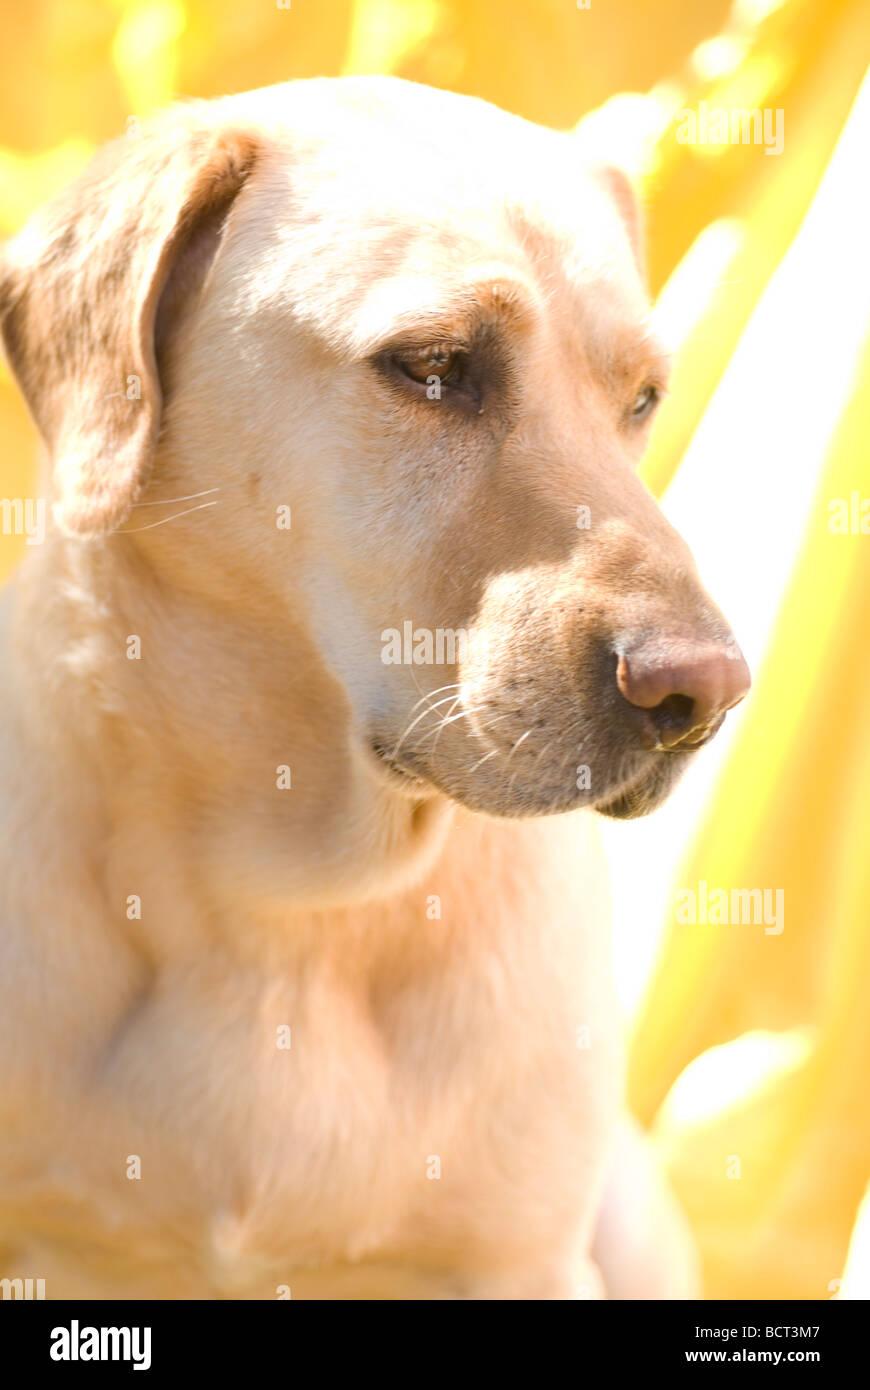 dog  Labrador on yellow background - Stock Image